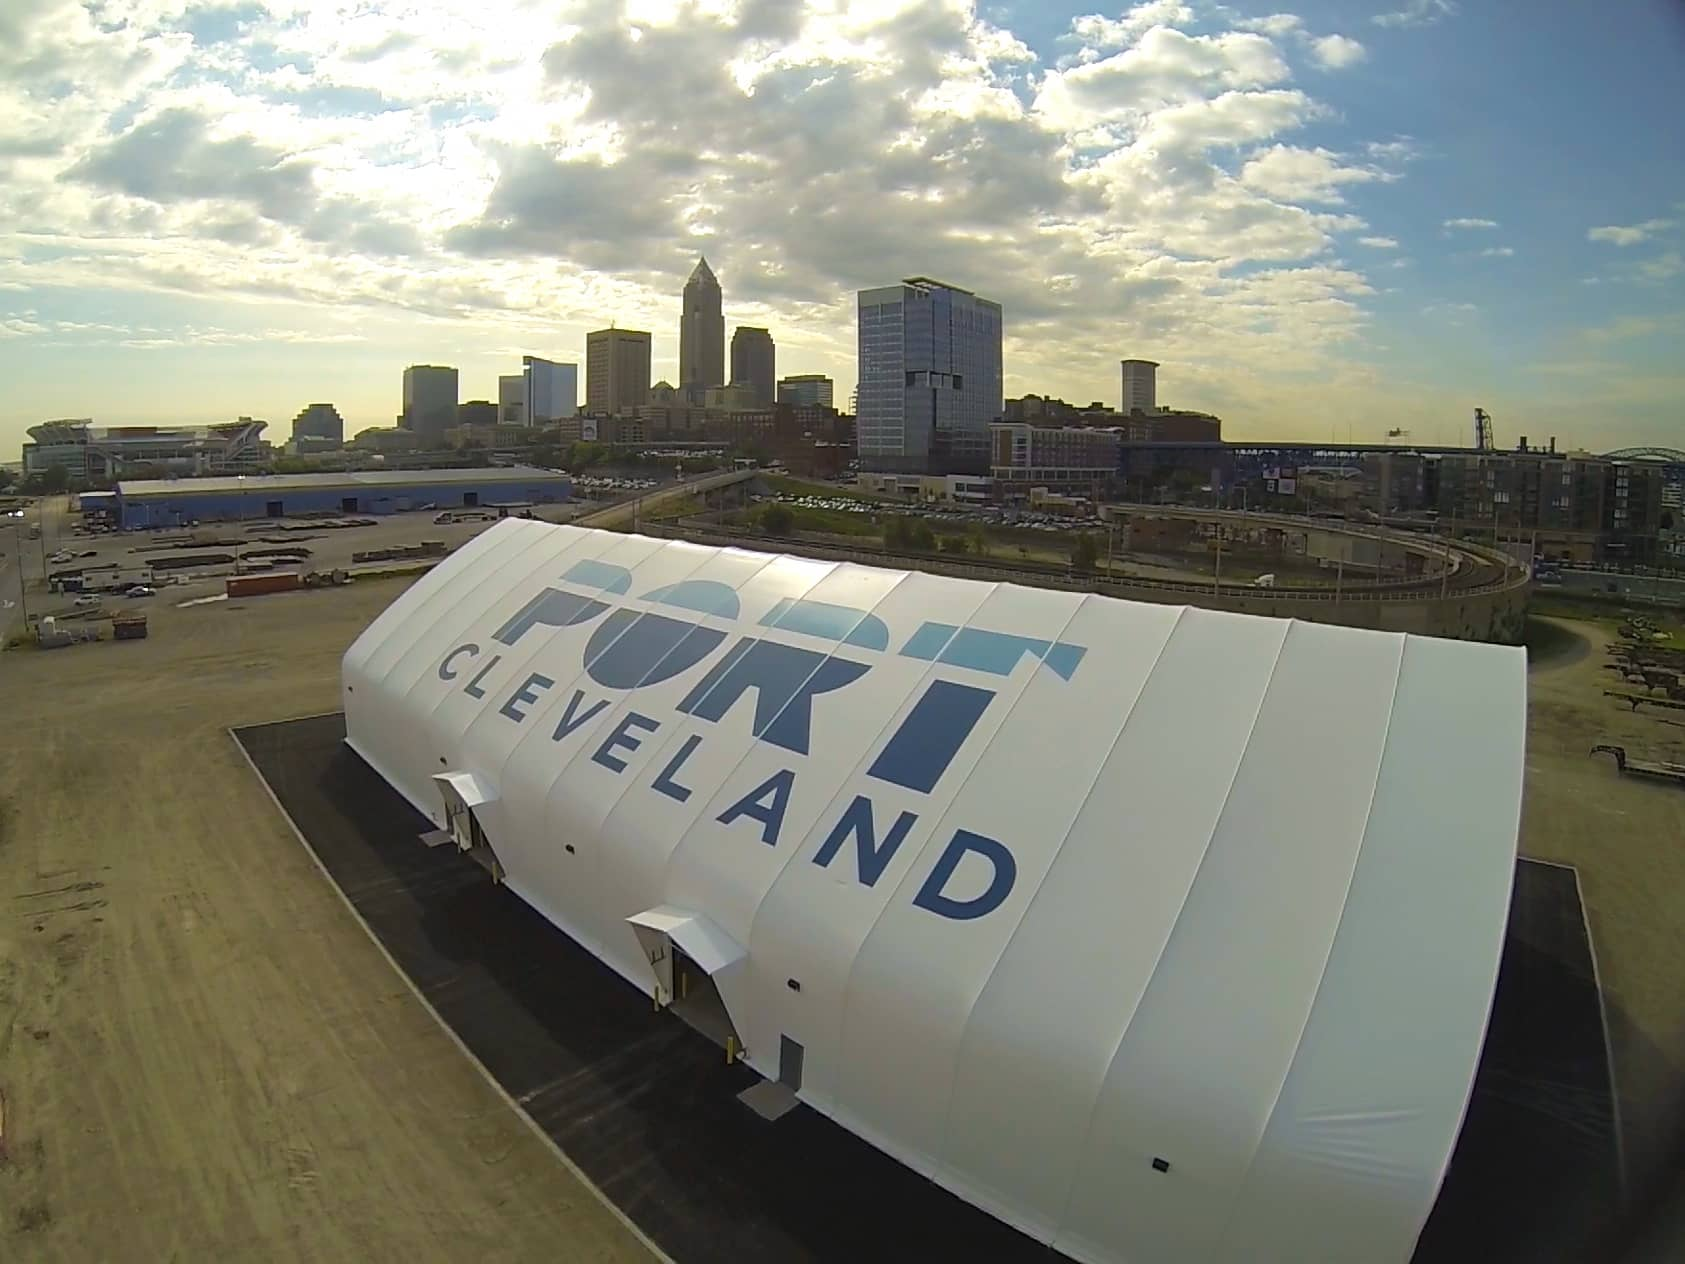 Port Cleveland